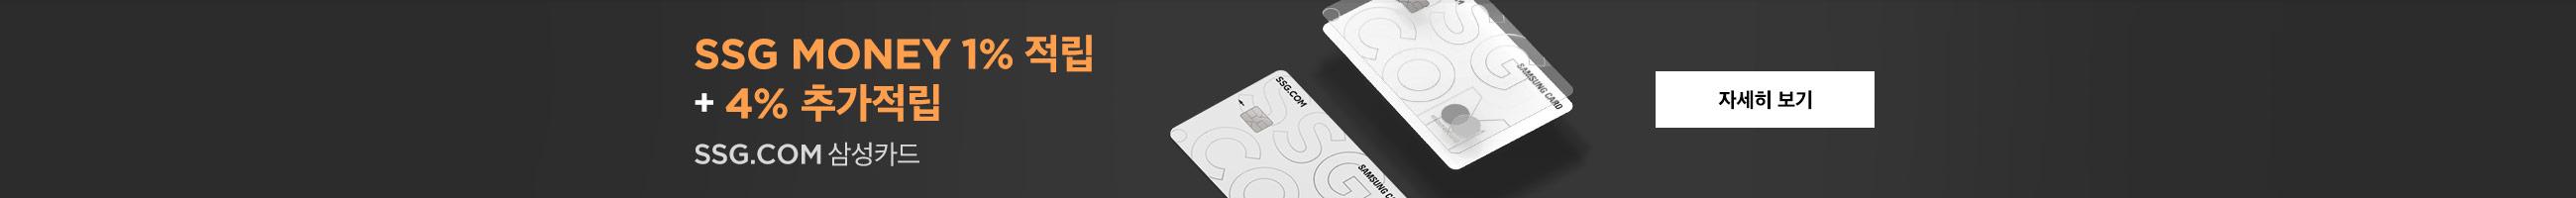 SSG MONEY 1% 적립 + 4% 추가적립 SSG.COM 삼성카드 자세히보기